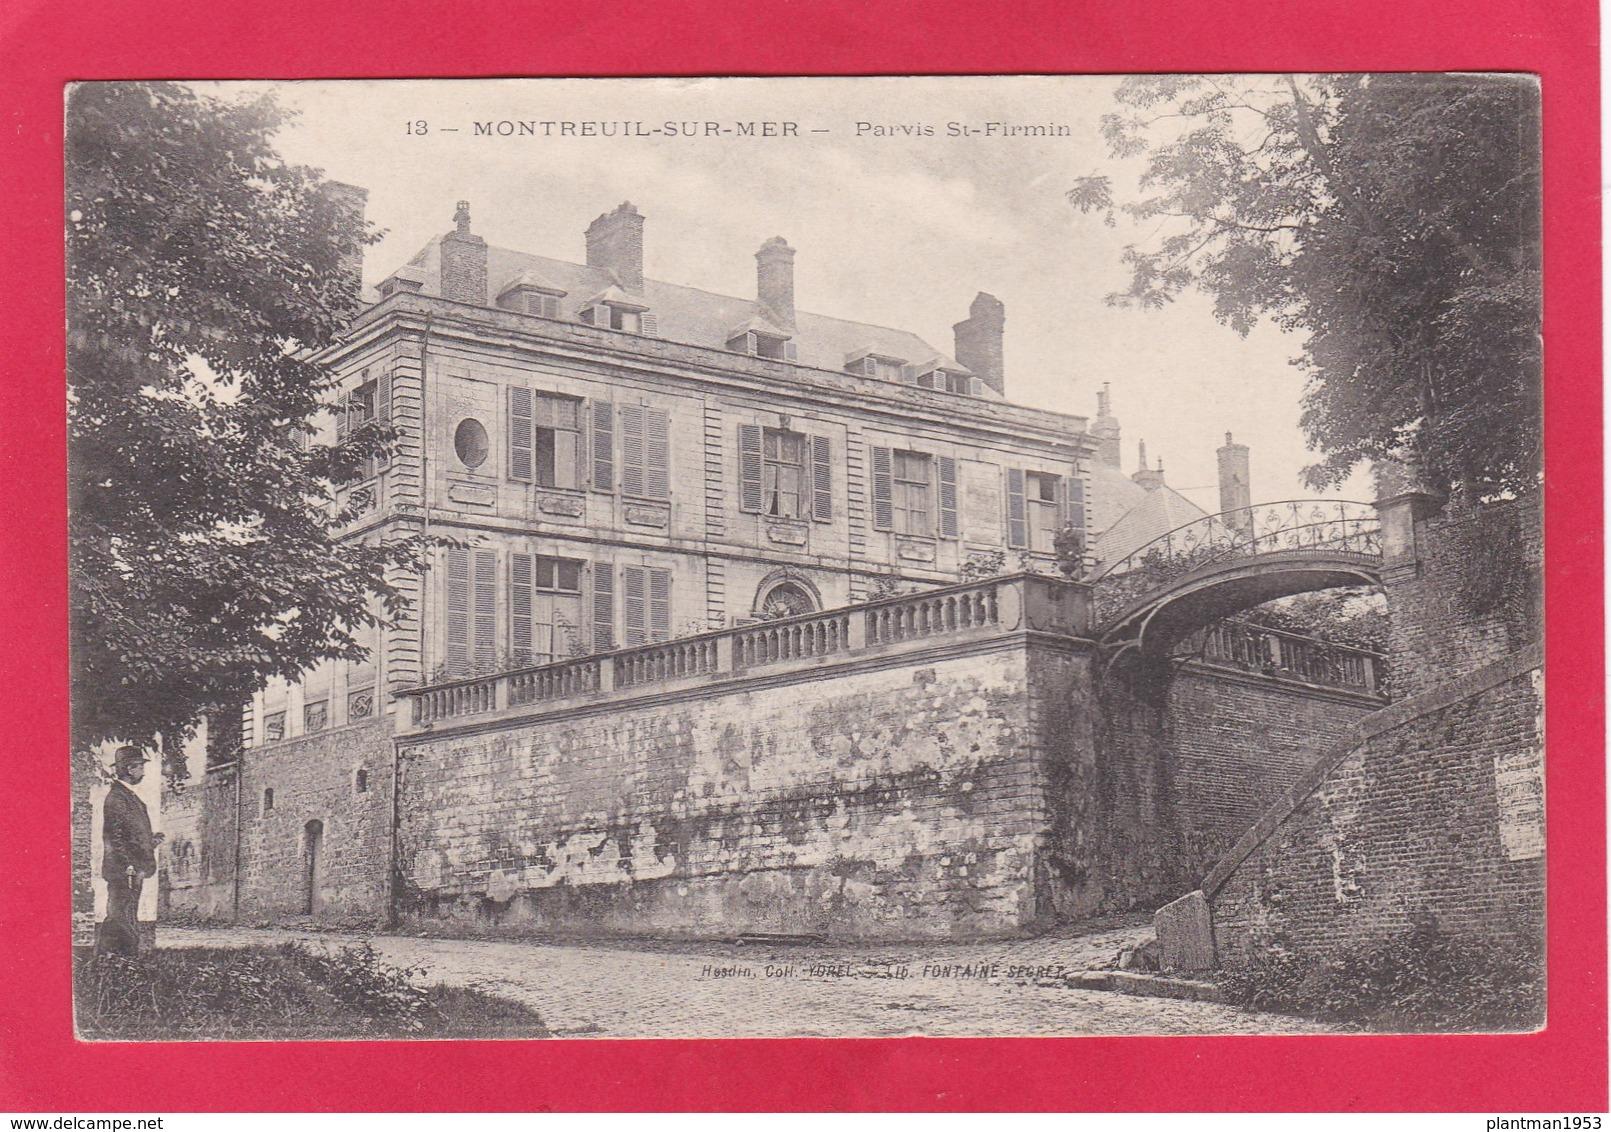 Old Post Card Of Montreuil-sur-Mer, Hauts-de-France, France,K61 - Montreuil